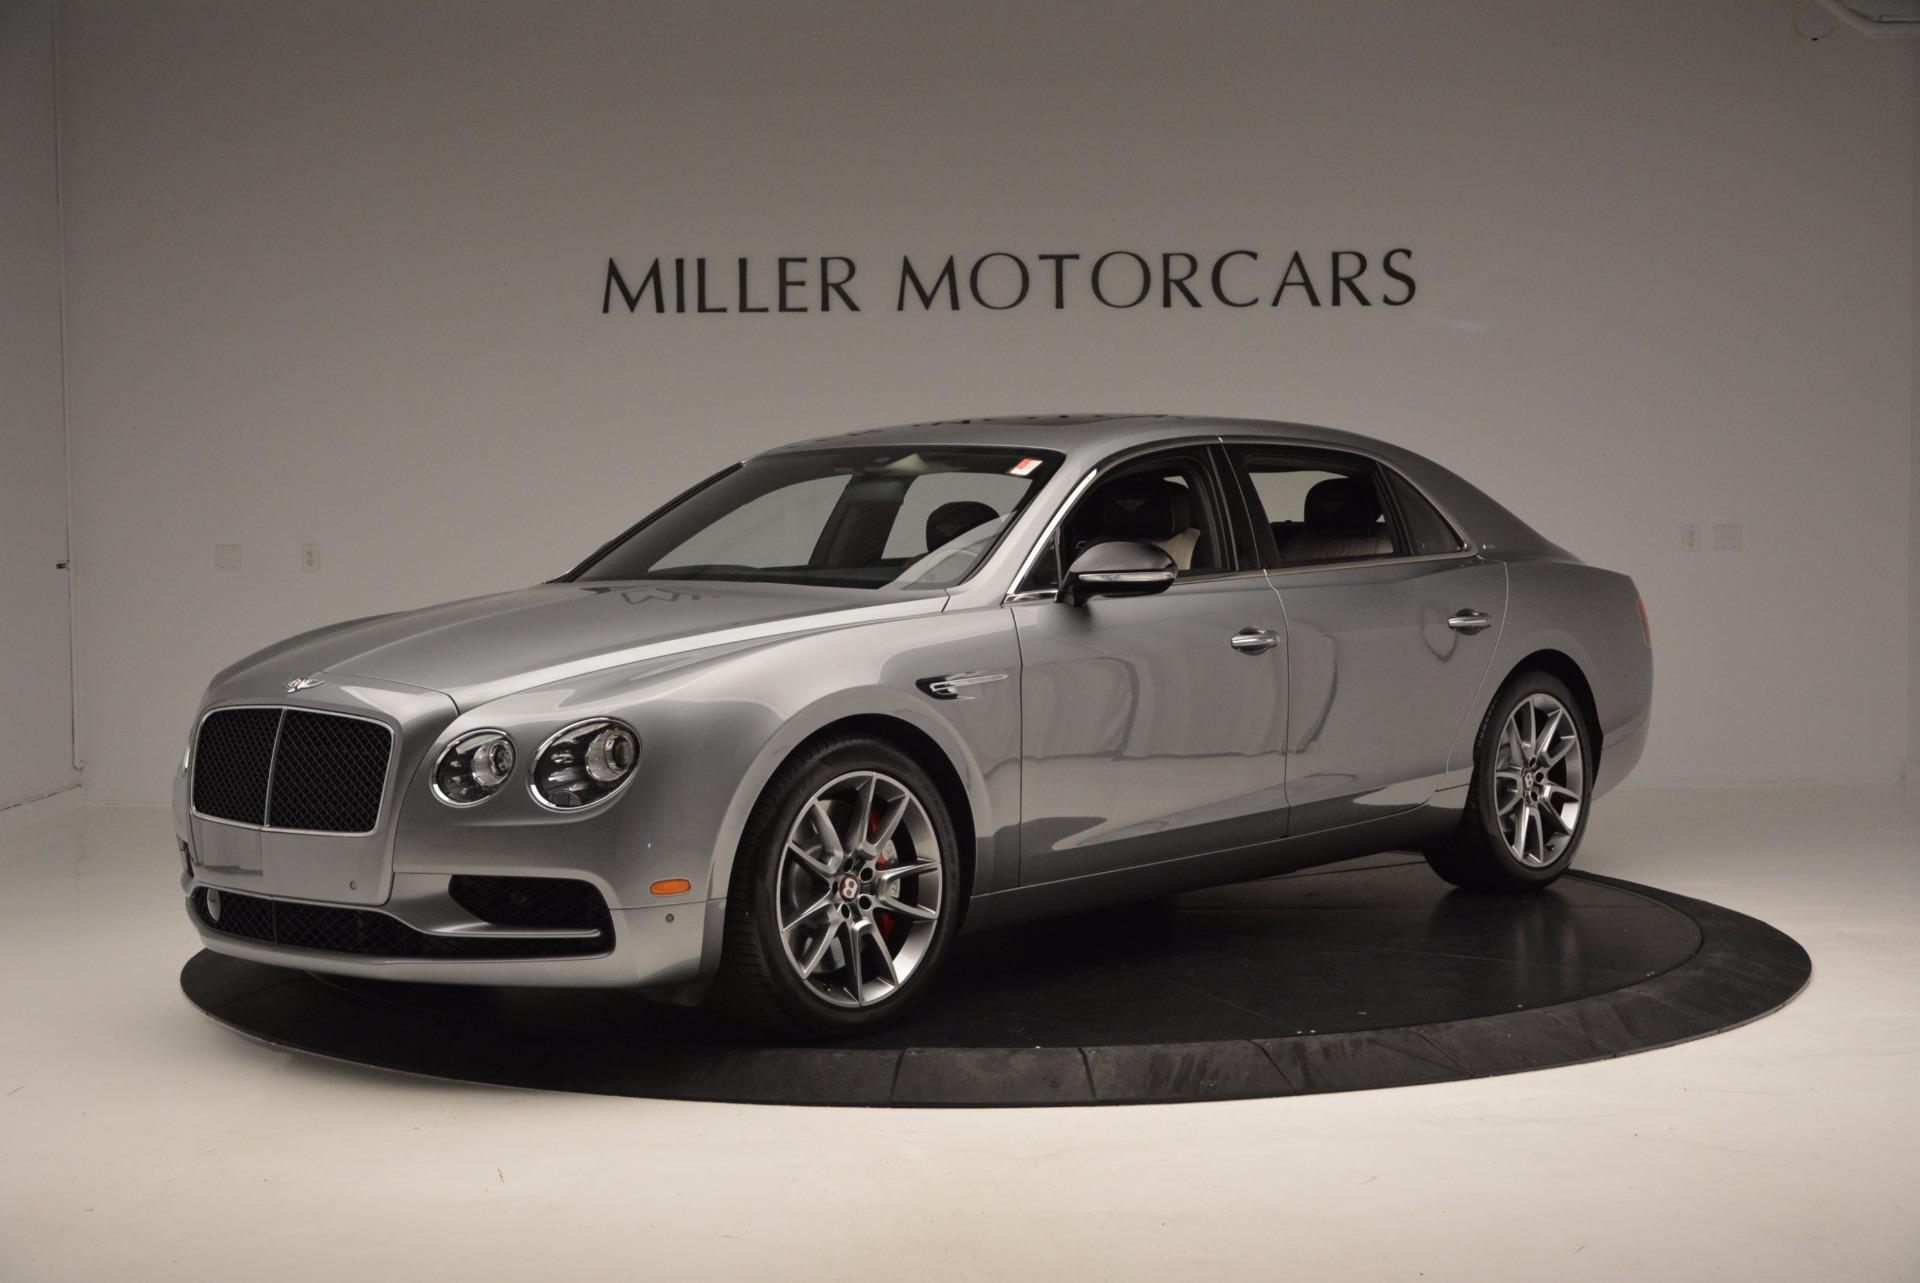 New 2017 Bentley Flying Spur V8 S  For Sale In Westport, CT 651_p3